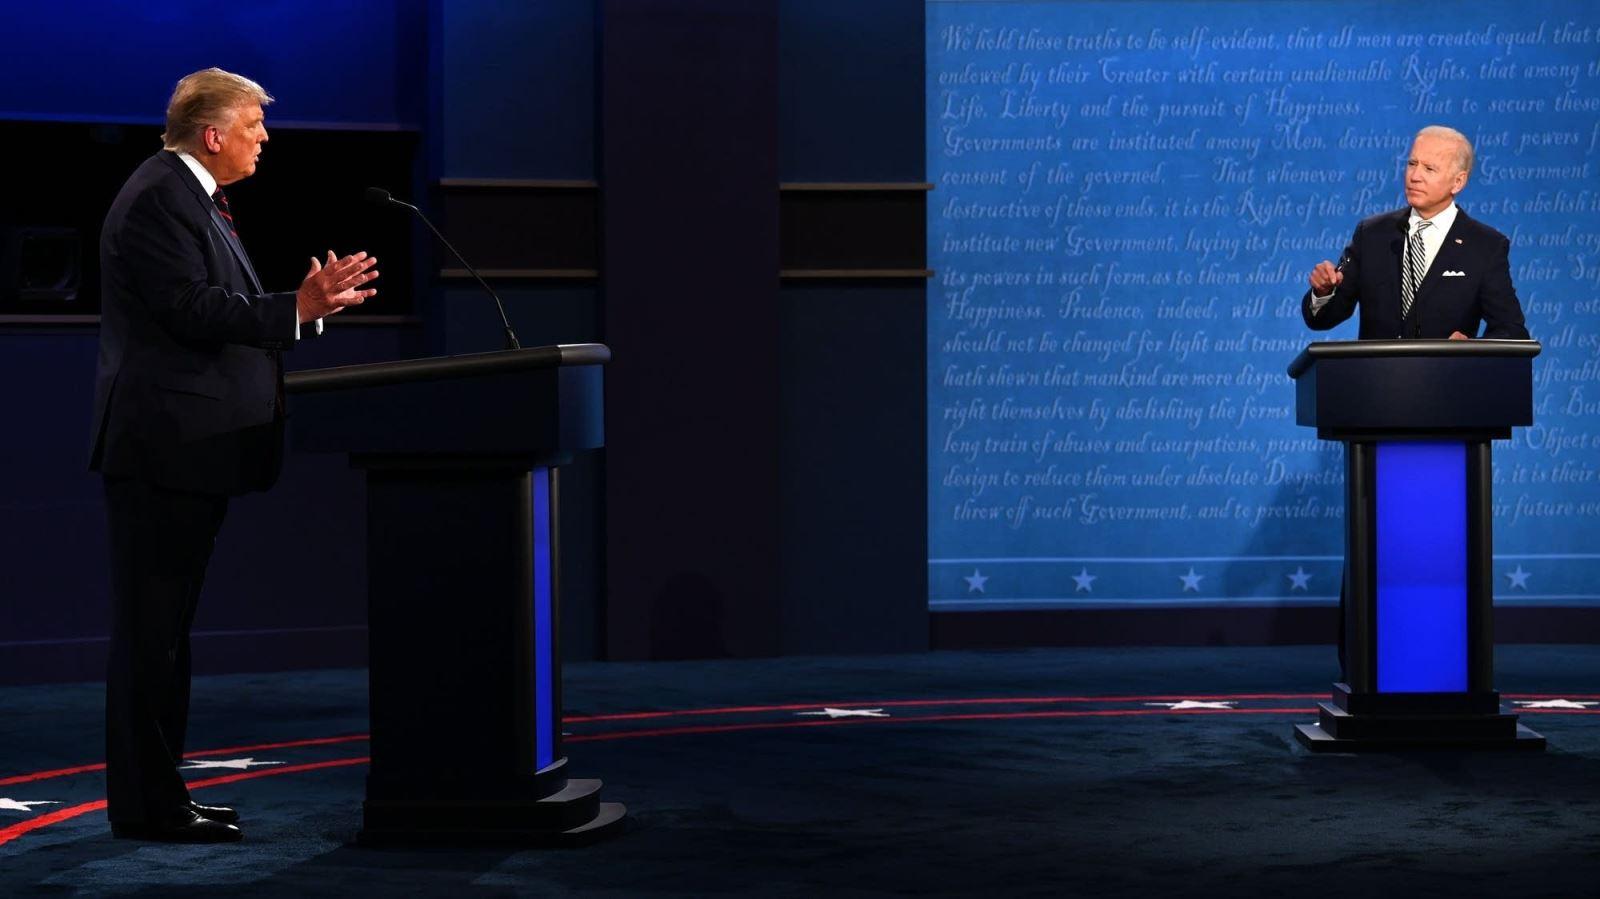 Trump-Biden tranh luận vòng 2: Hủy!